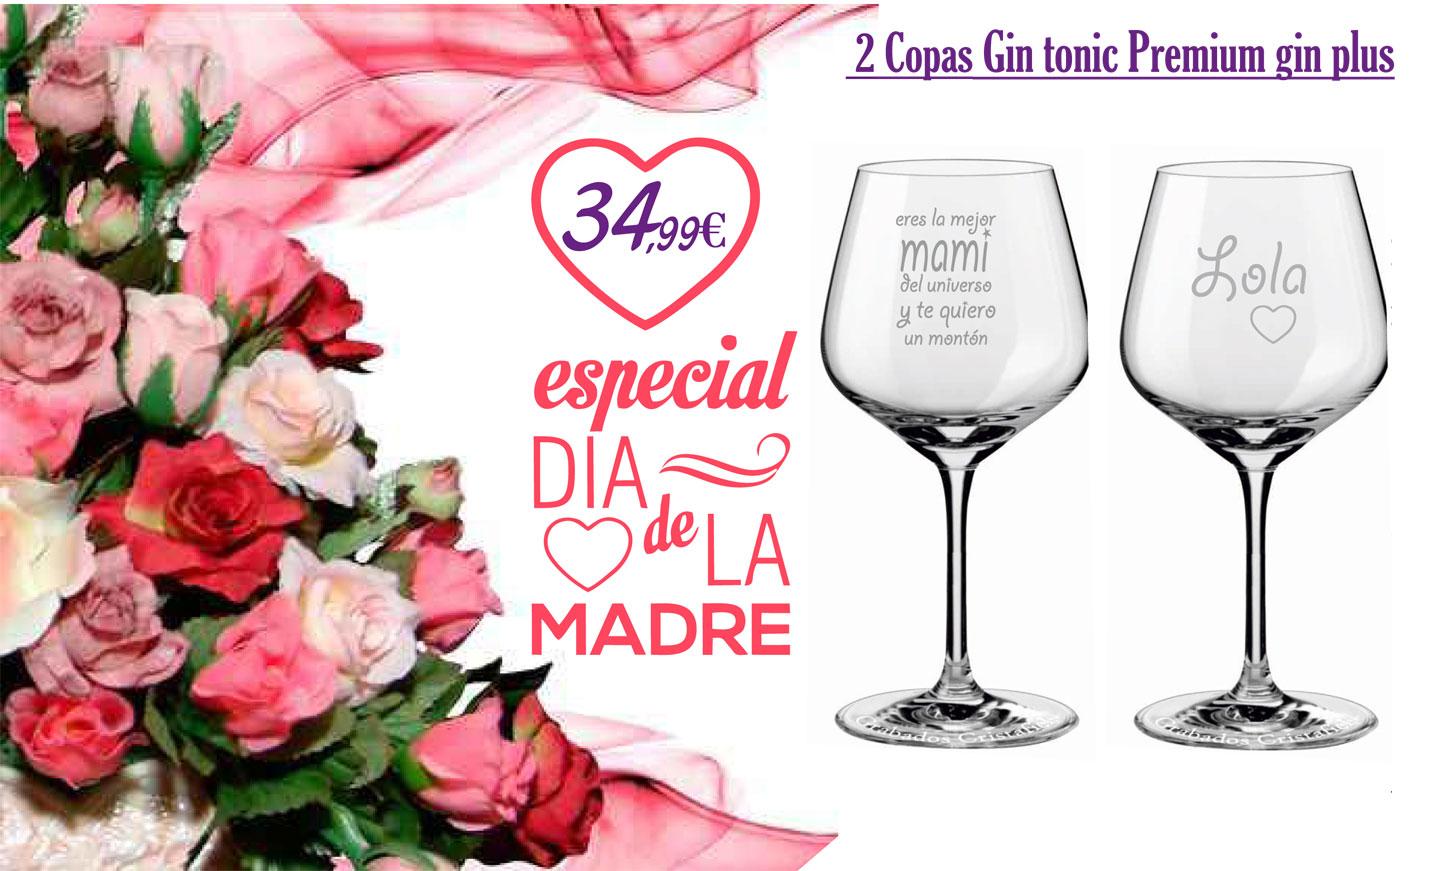 Cristafiel 2 Copas Gin Tonic Premium gin plus